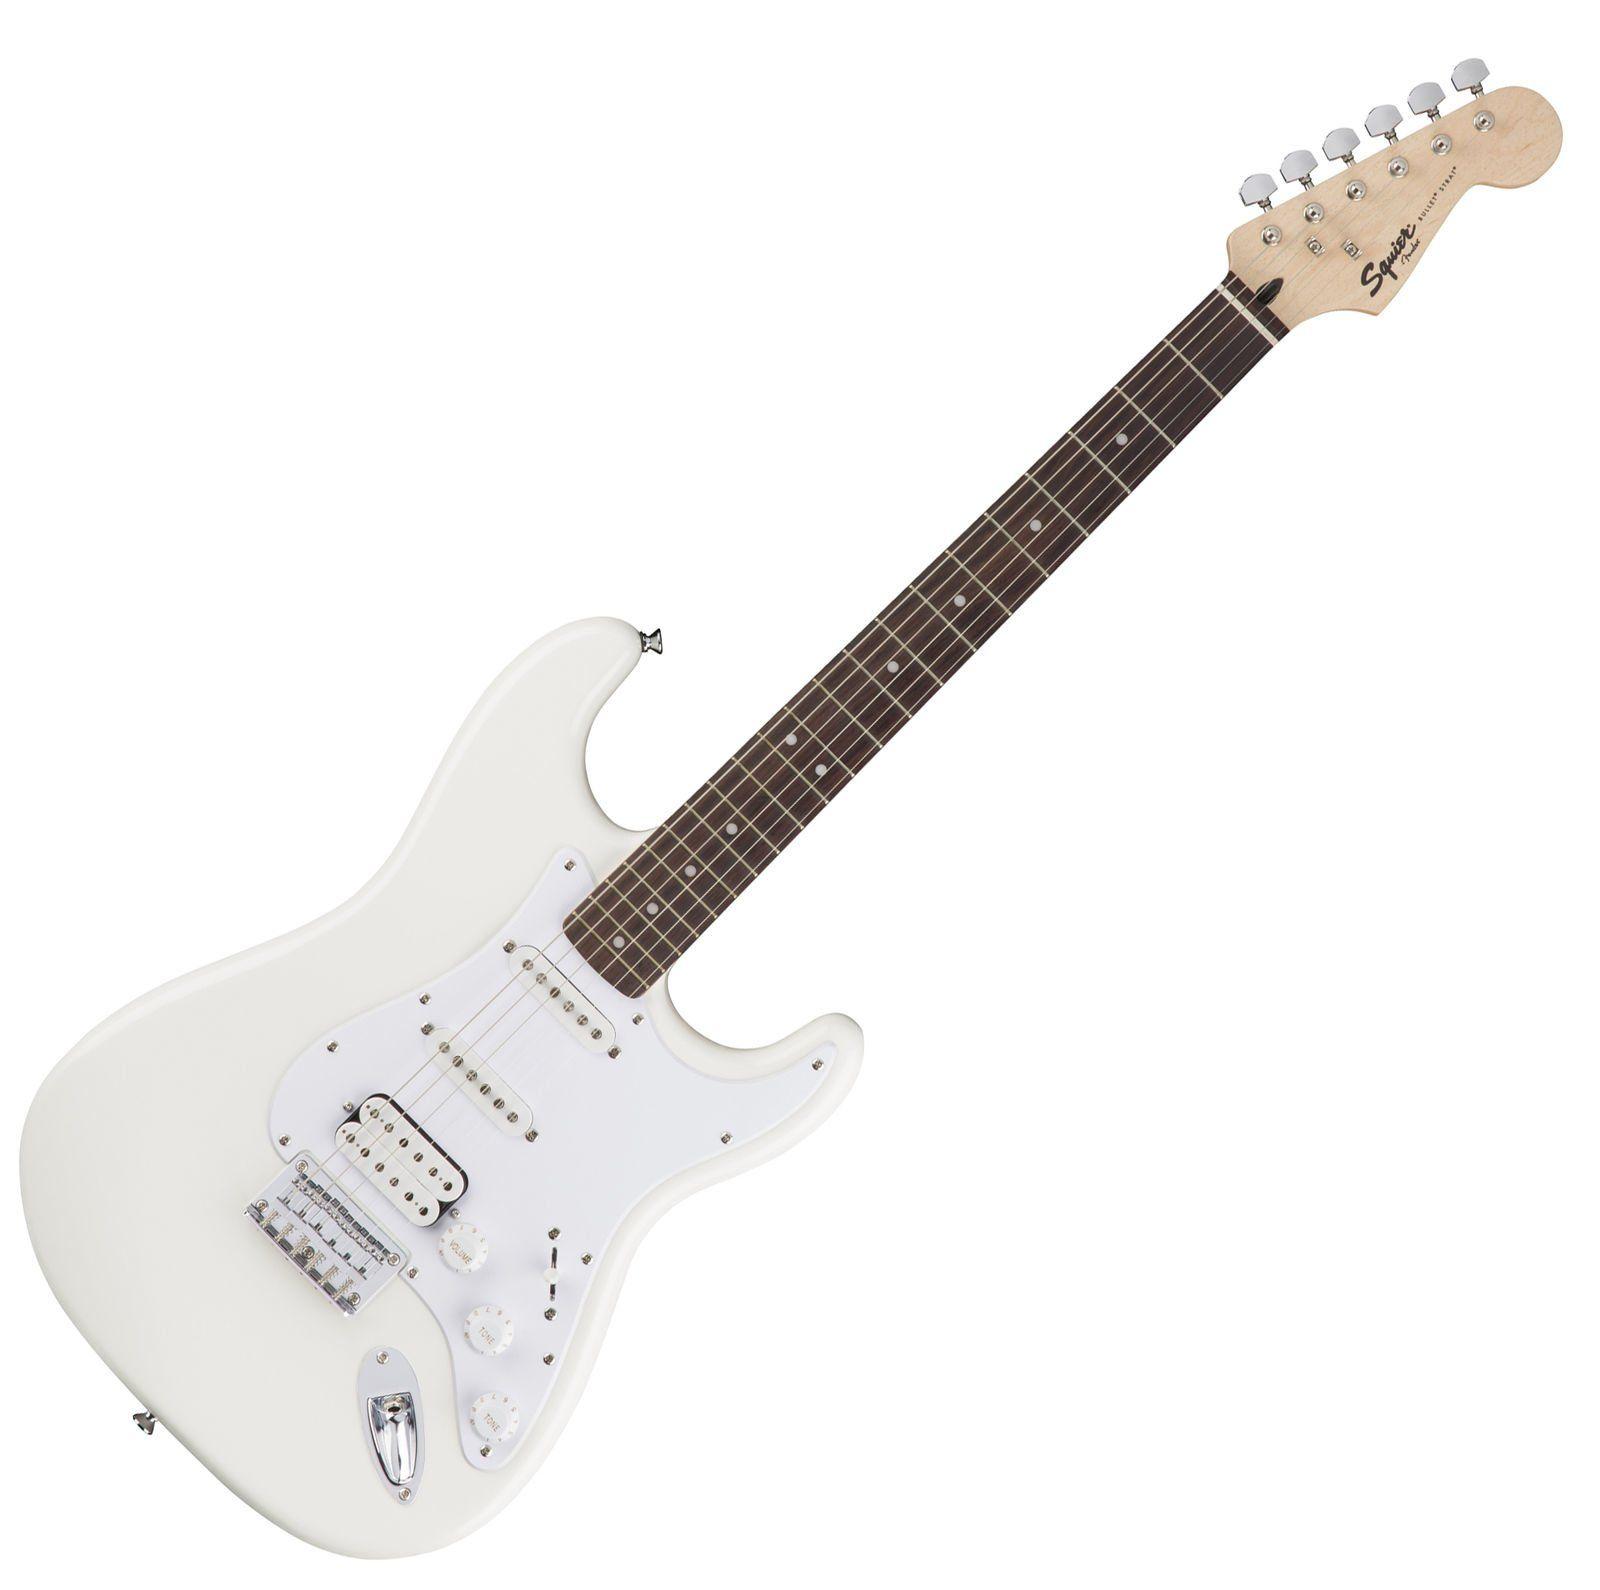 Guitarra Fender - Squier Bullet Stratocaster HSS-580 Arctic White